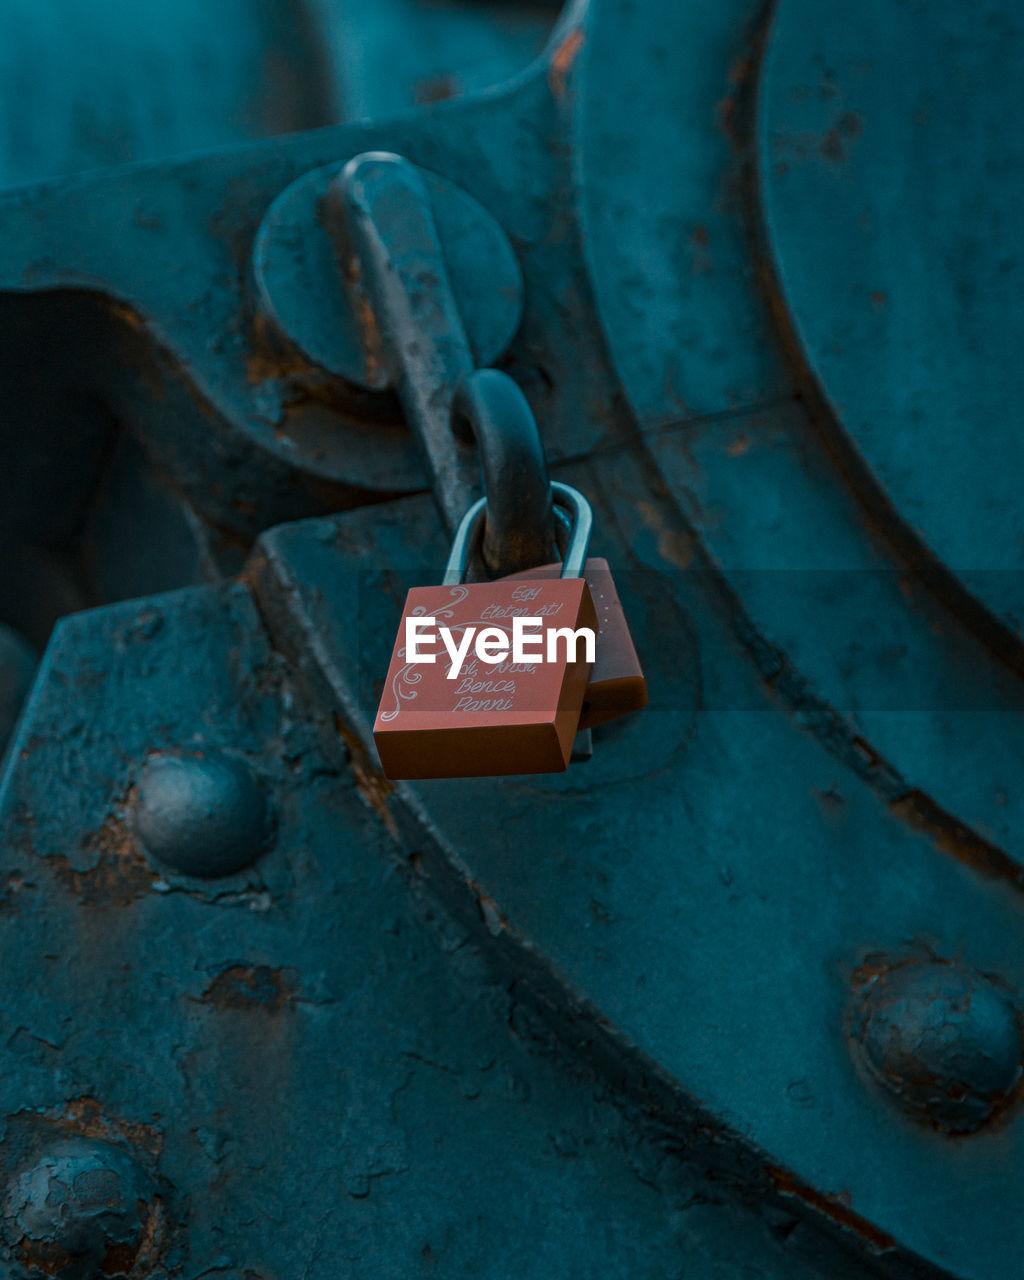 Lovely lock from someone else's memory